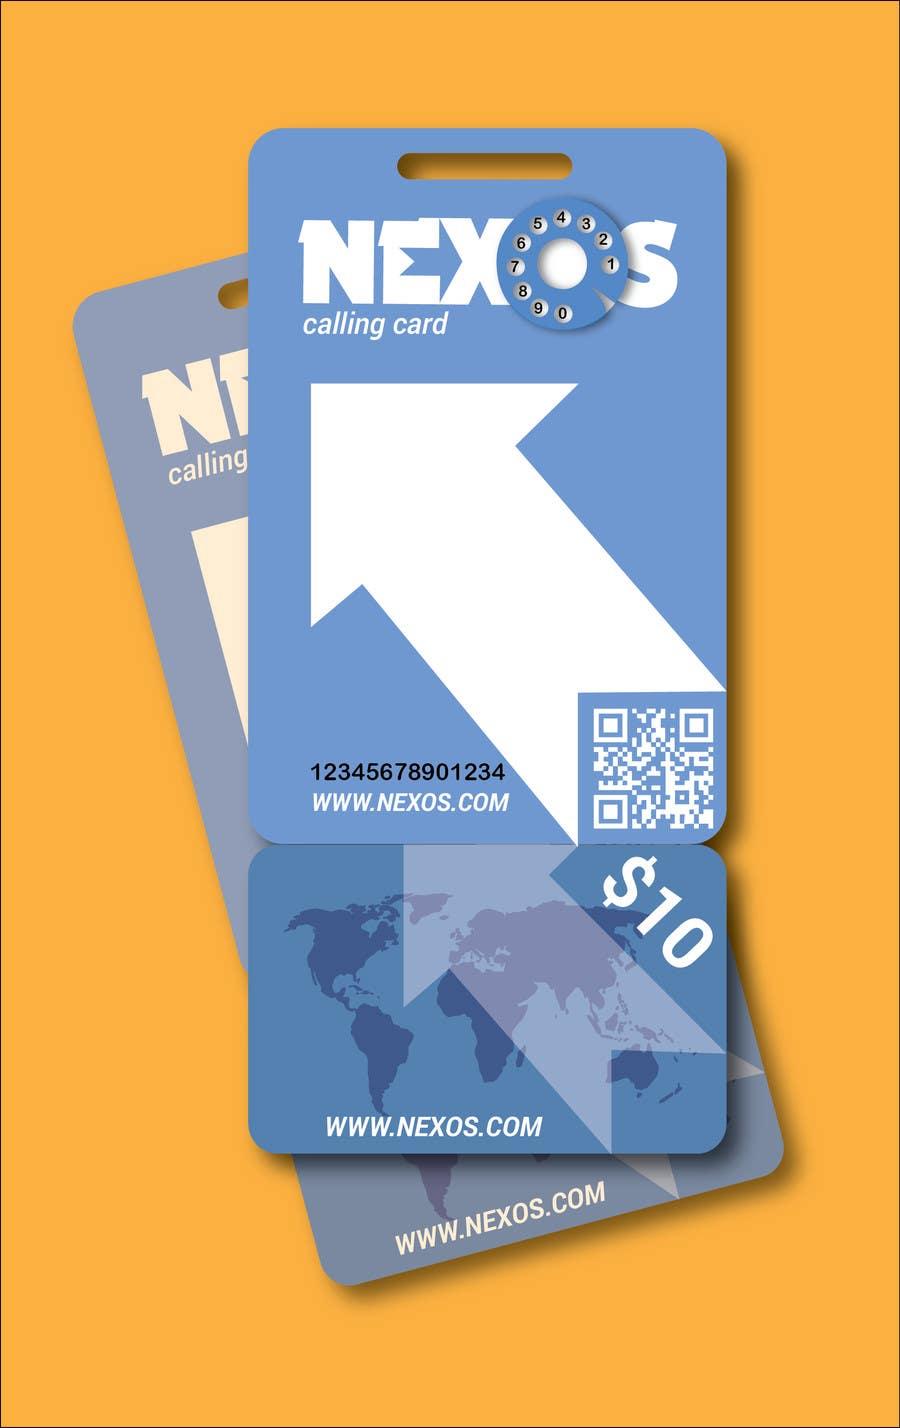 Penyertaan Peraduan #                                        53                                      untuk                                         Design a Logo for a Calling card